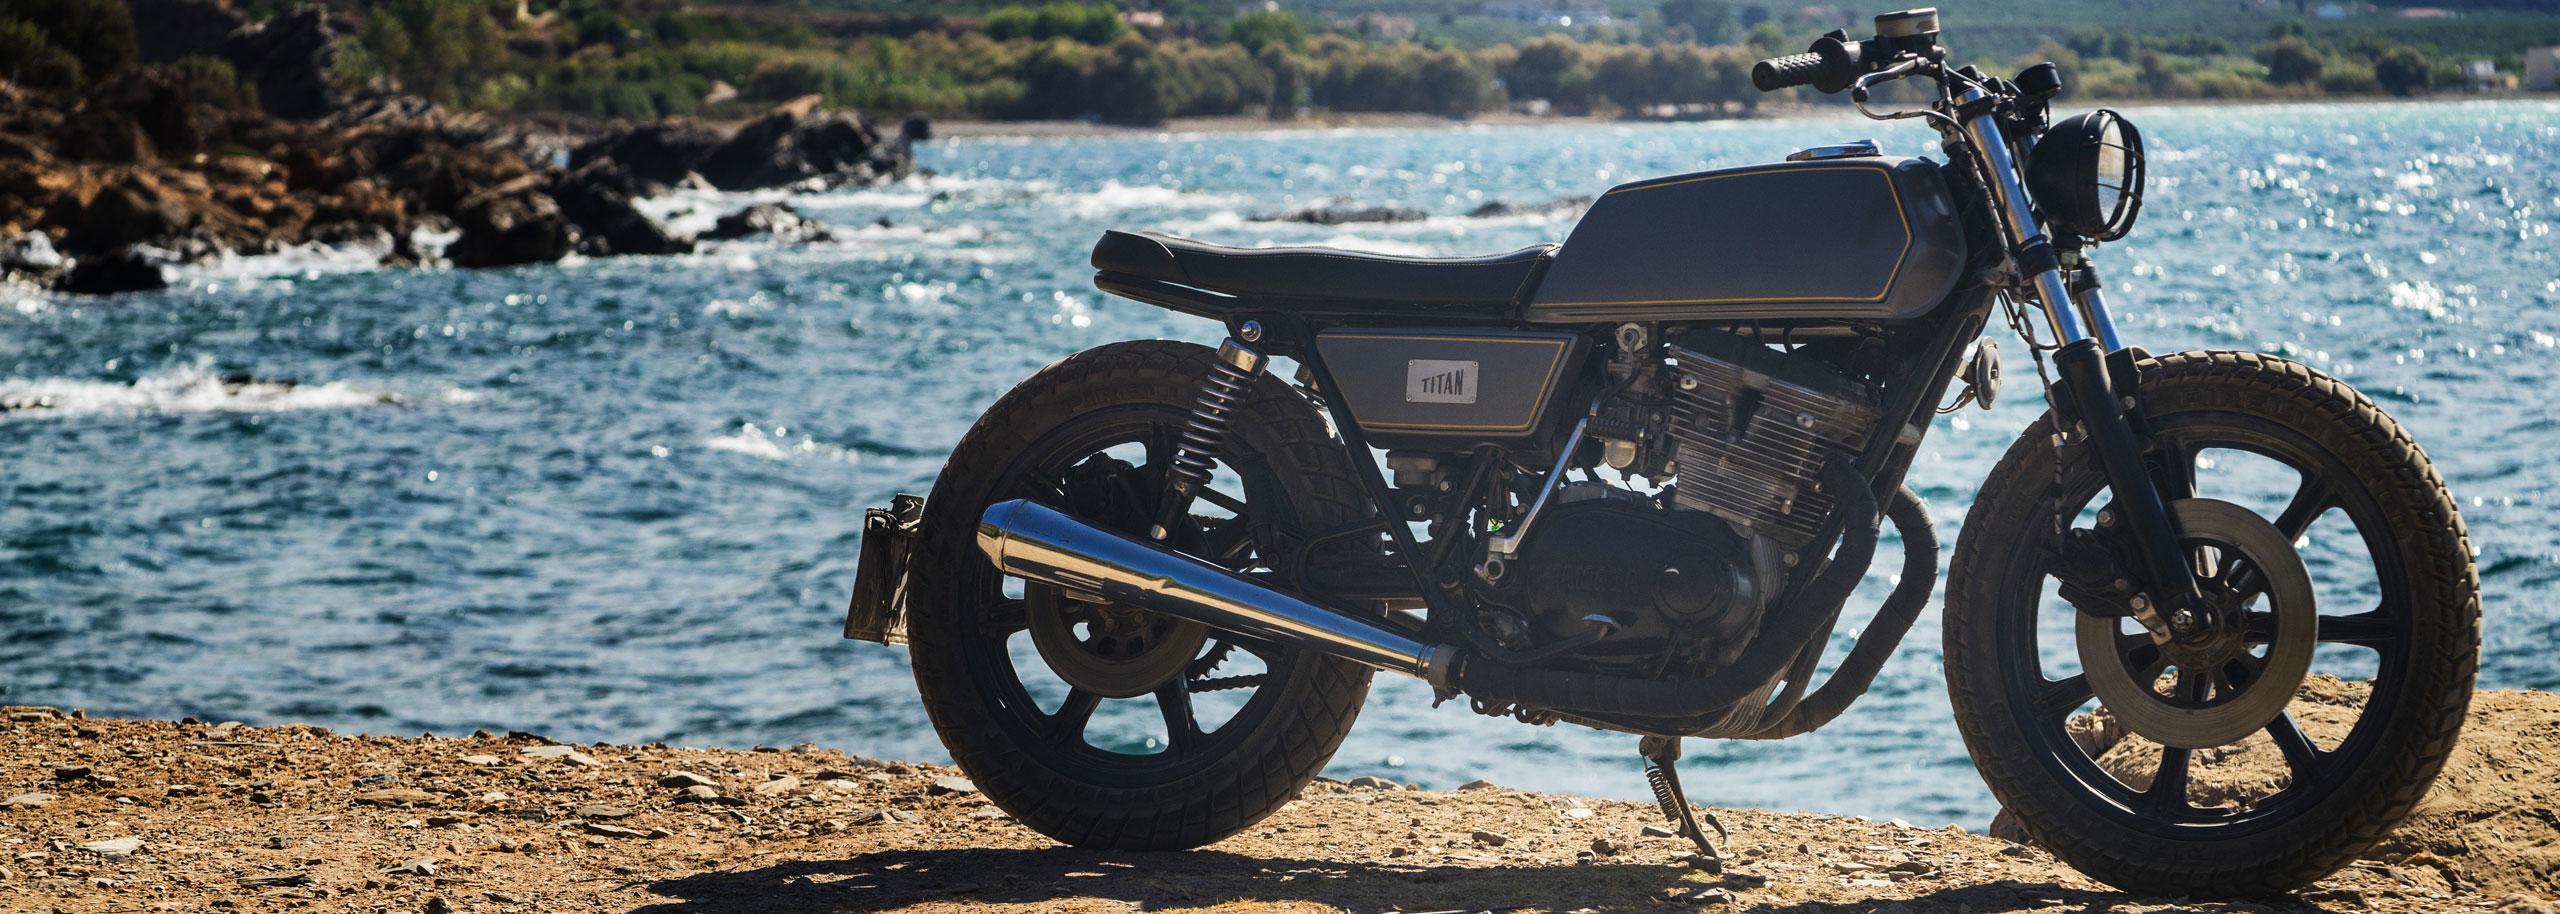 04_TITAN-Greek_Yamaha-Umbau-XS-500_Cafe-Racer-Graz-Motorrad-Umbau-Austria-Vintage_Custom-Bikes_Zweirad_Custom